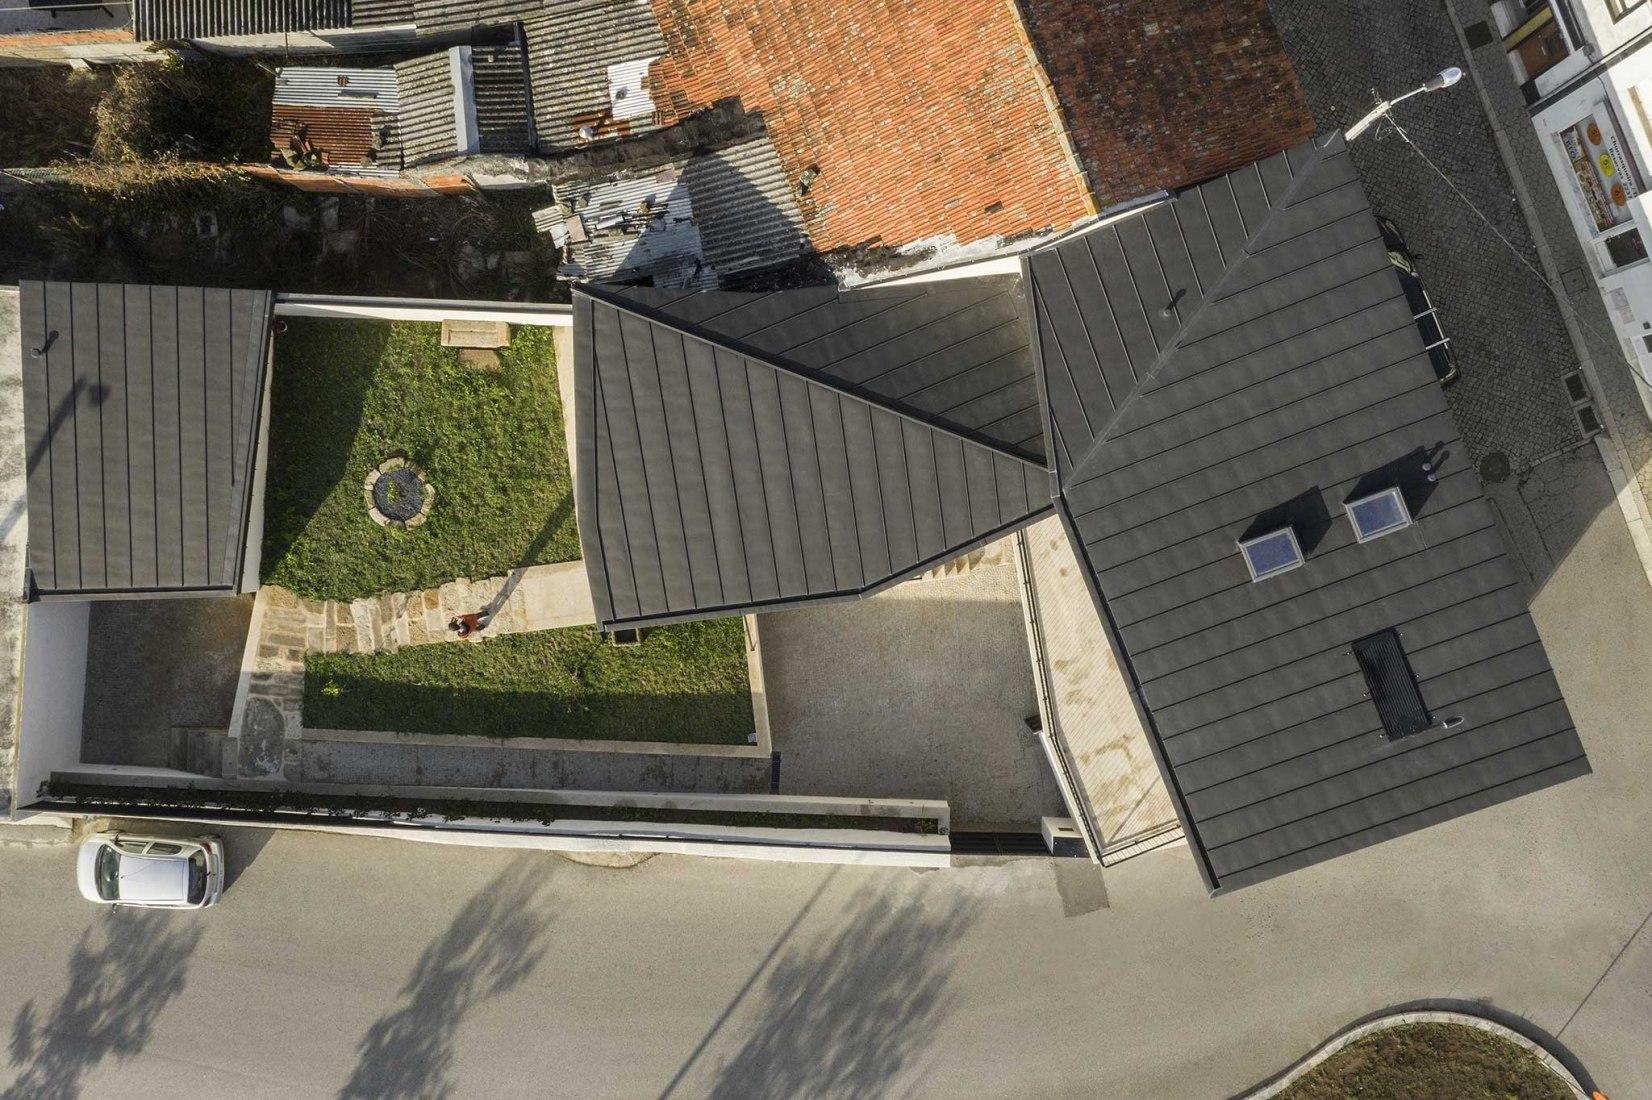 Casa Santa Marinha by Paulo Moreira Architectures. Photograph by Ivo Tavares Studio